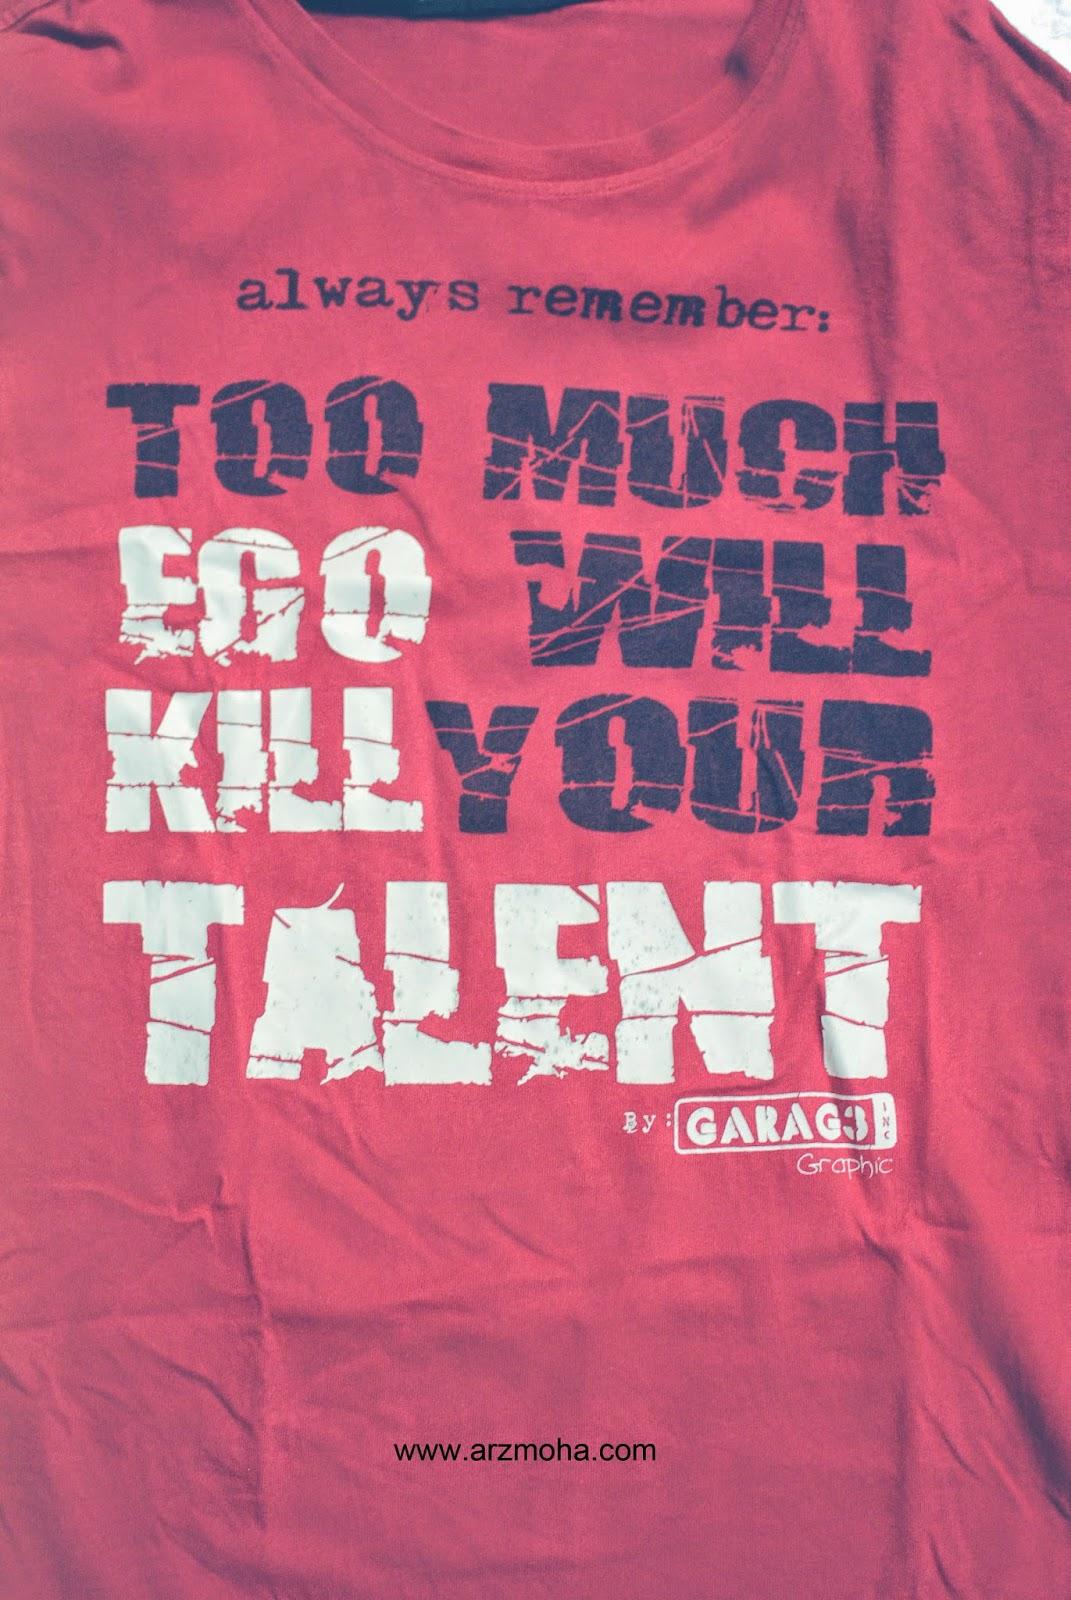 Ego, talent, sabtu, sabtu yang ceria, arzmoha